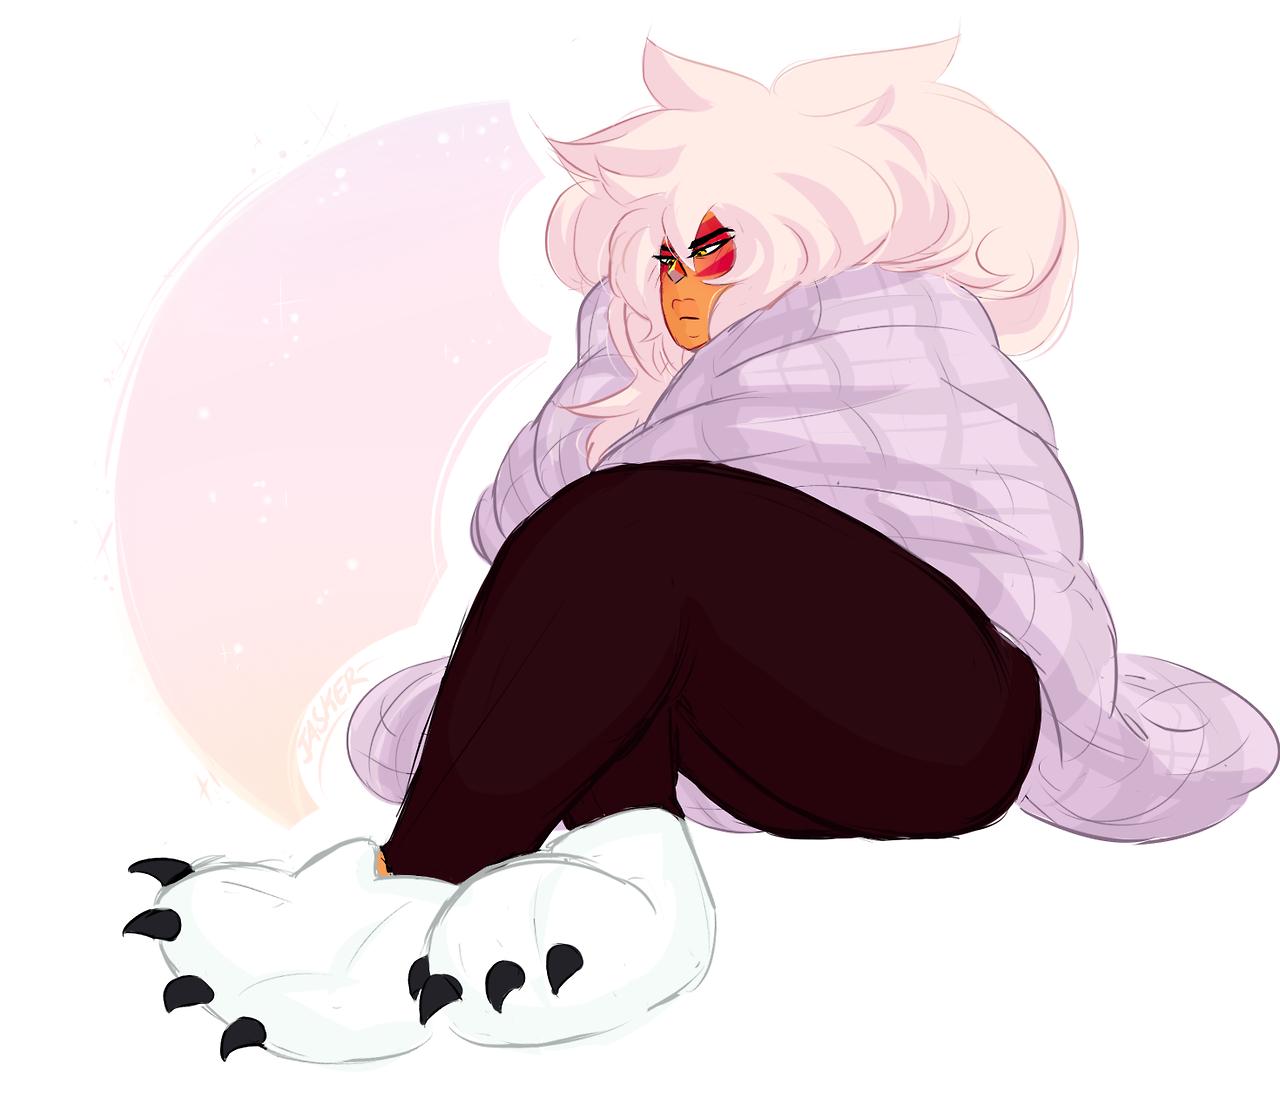 gets fuzzy novelty slippers at walmart immediately draws jasper in them